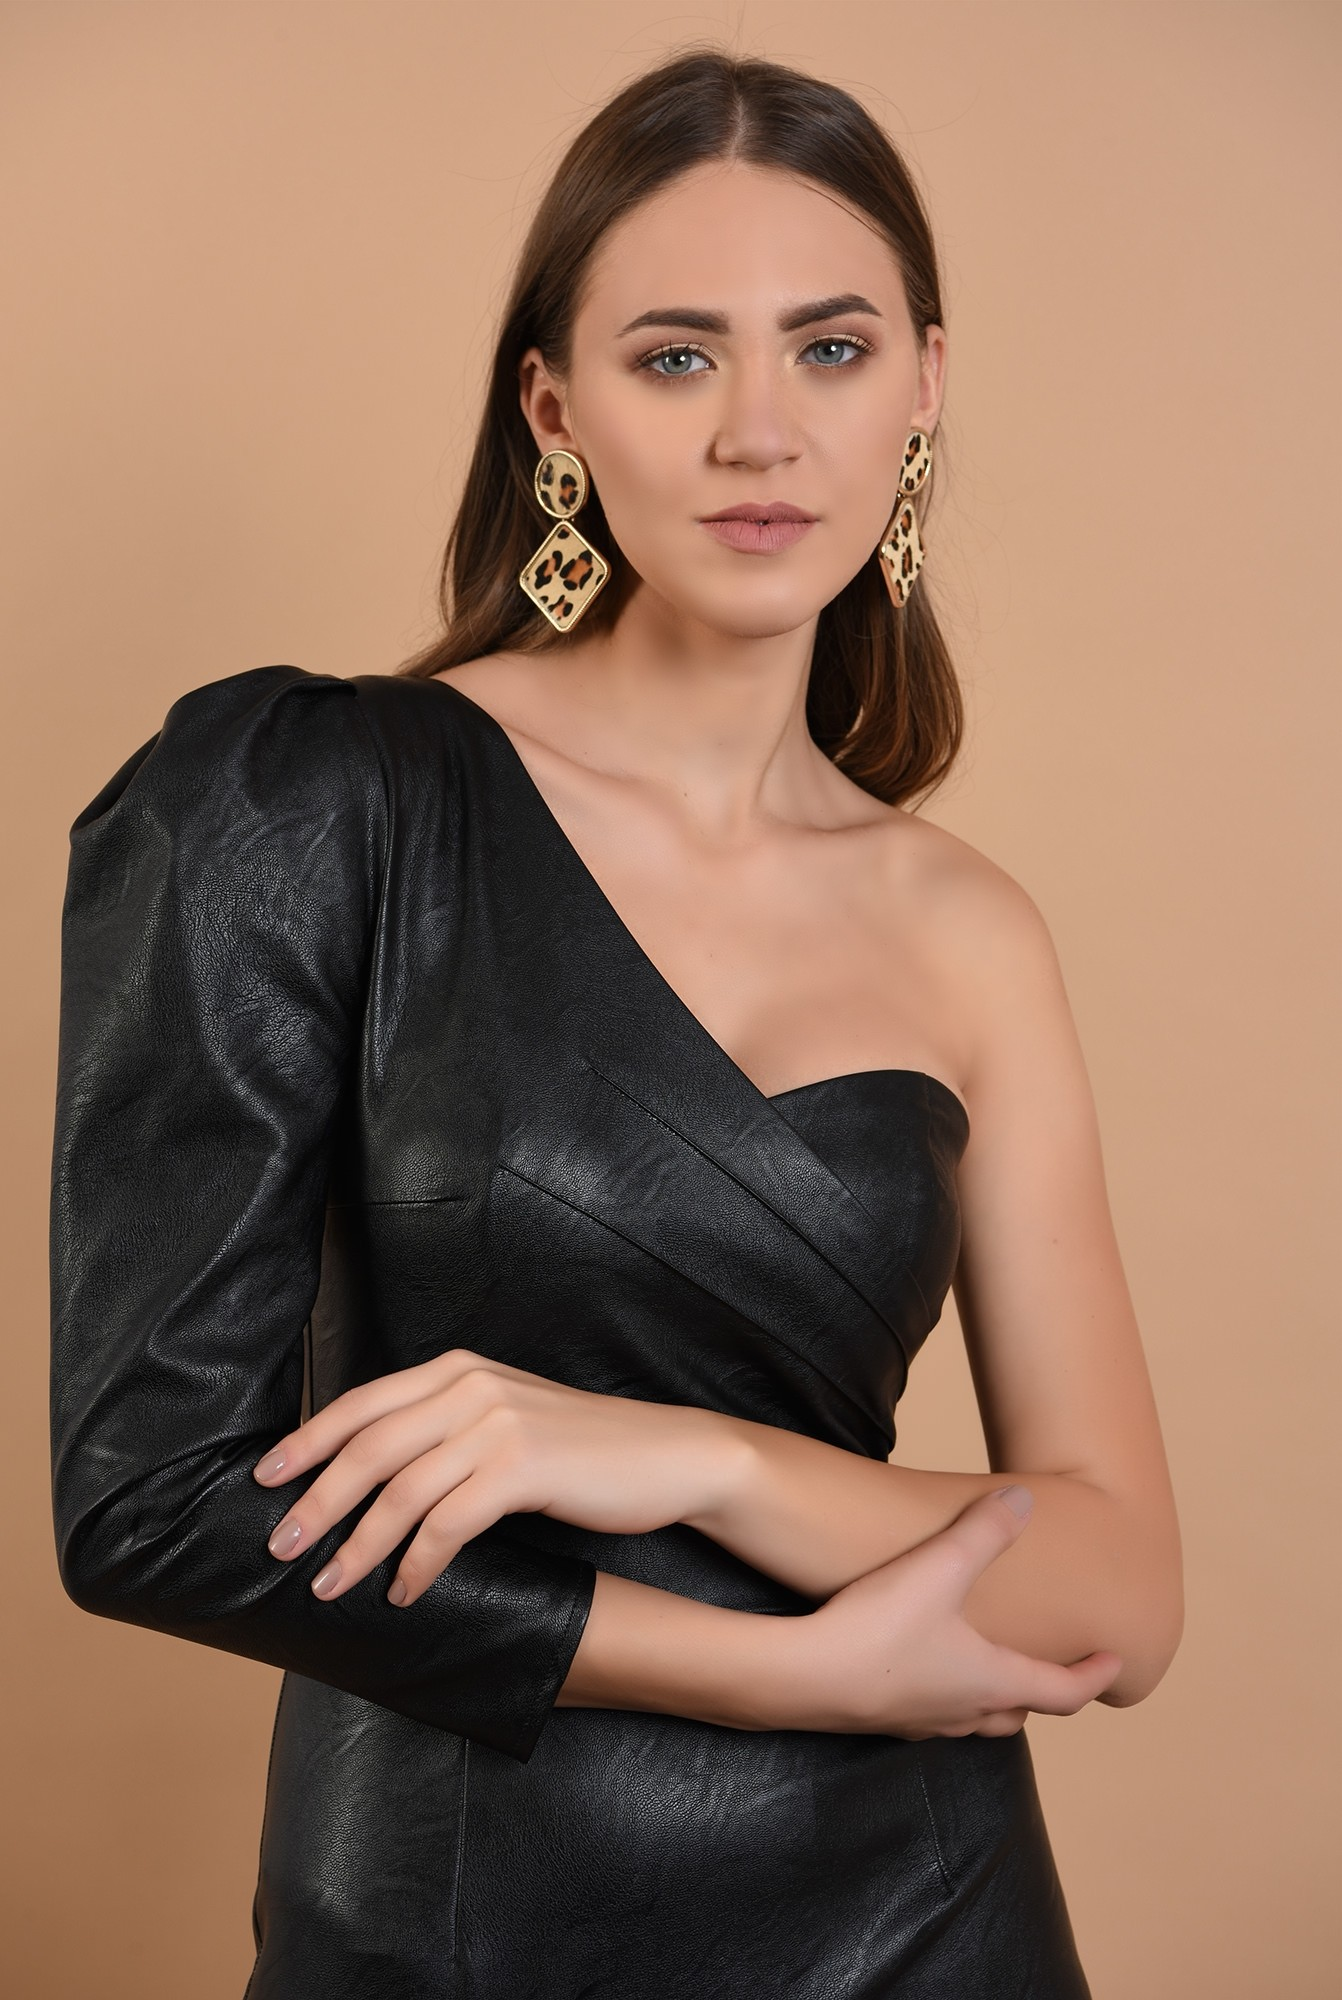 2 - rochie eleganta, piele neagra, maneca drapata, umar gol